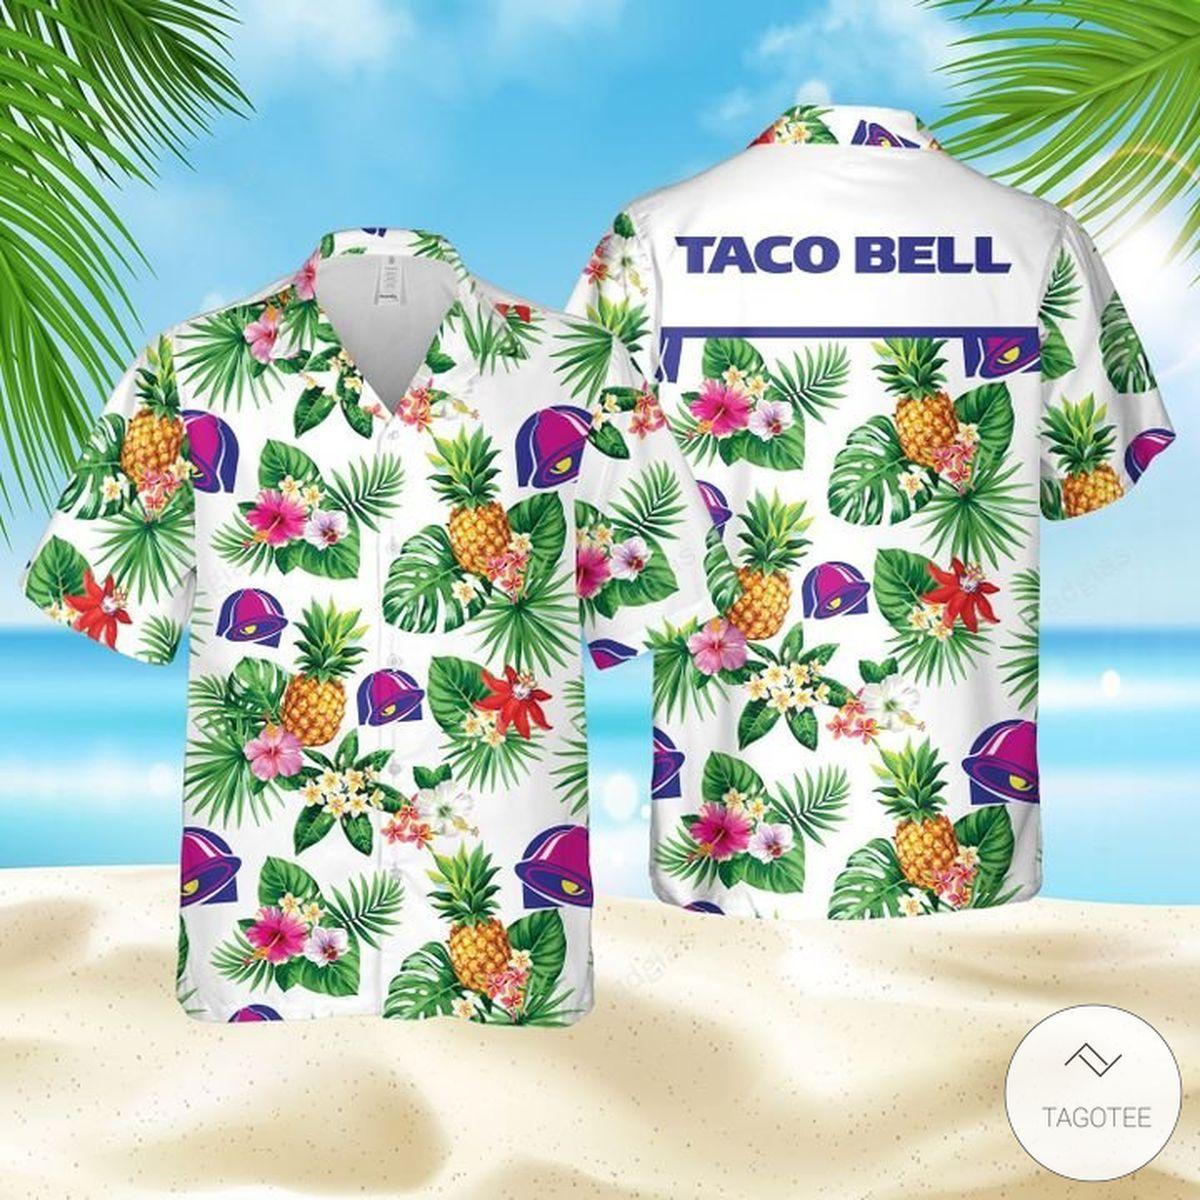 Free Taco Bell Hawaiian shirt, Beach Shorts